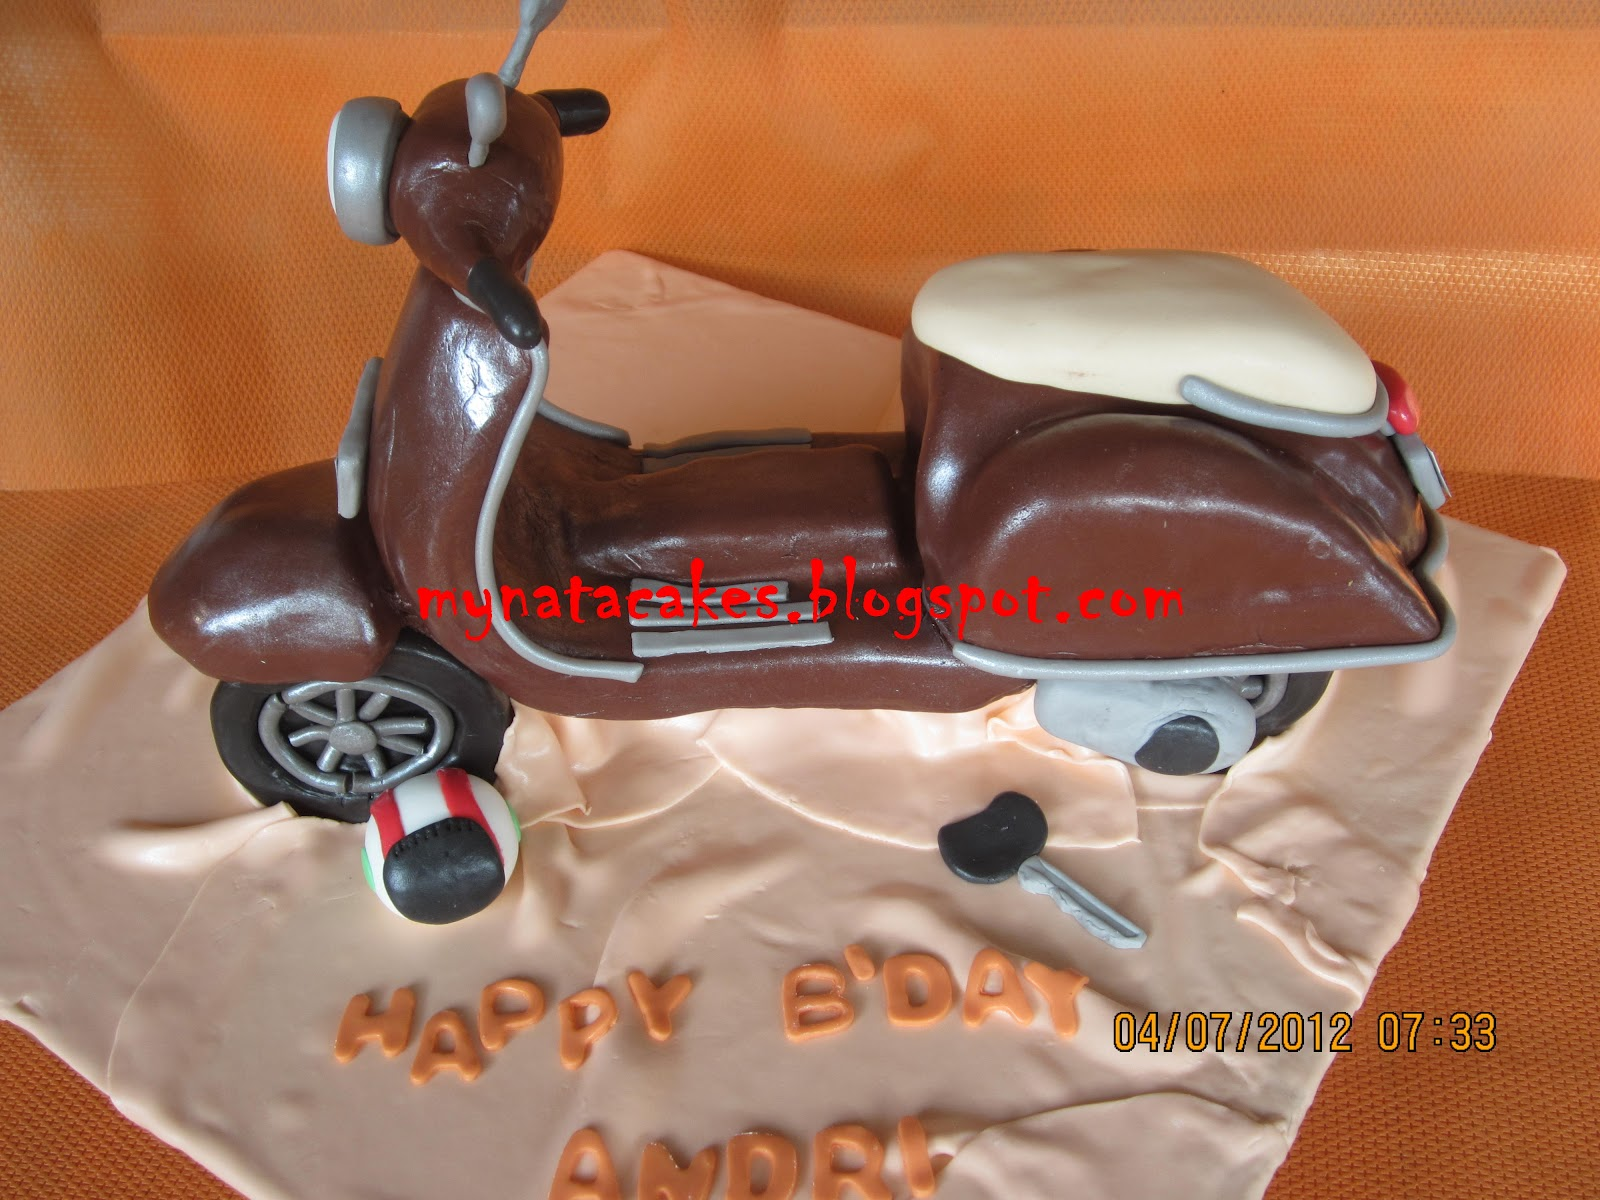 Mynata Cakes Vespa birthday cake for Andry